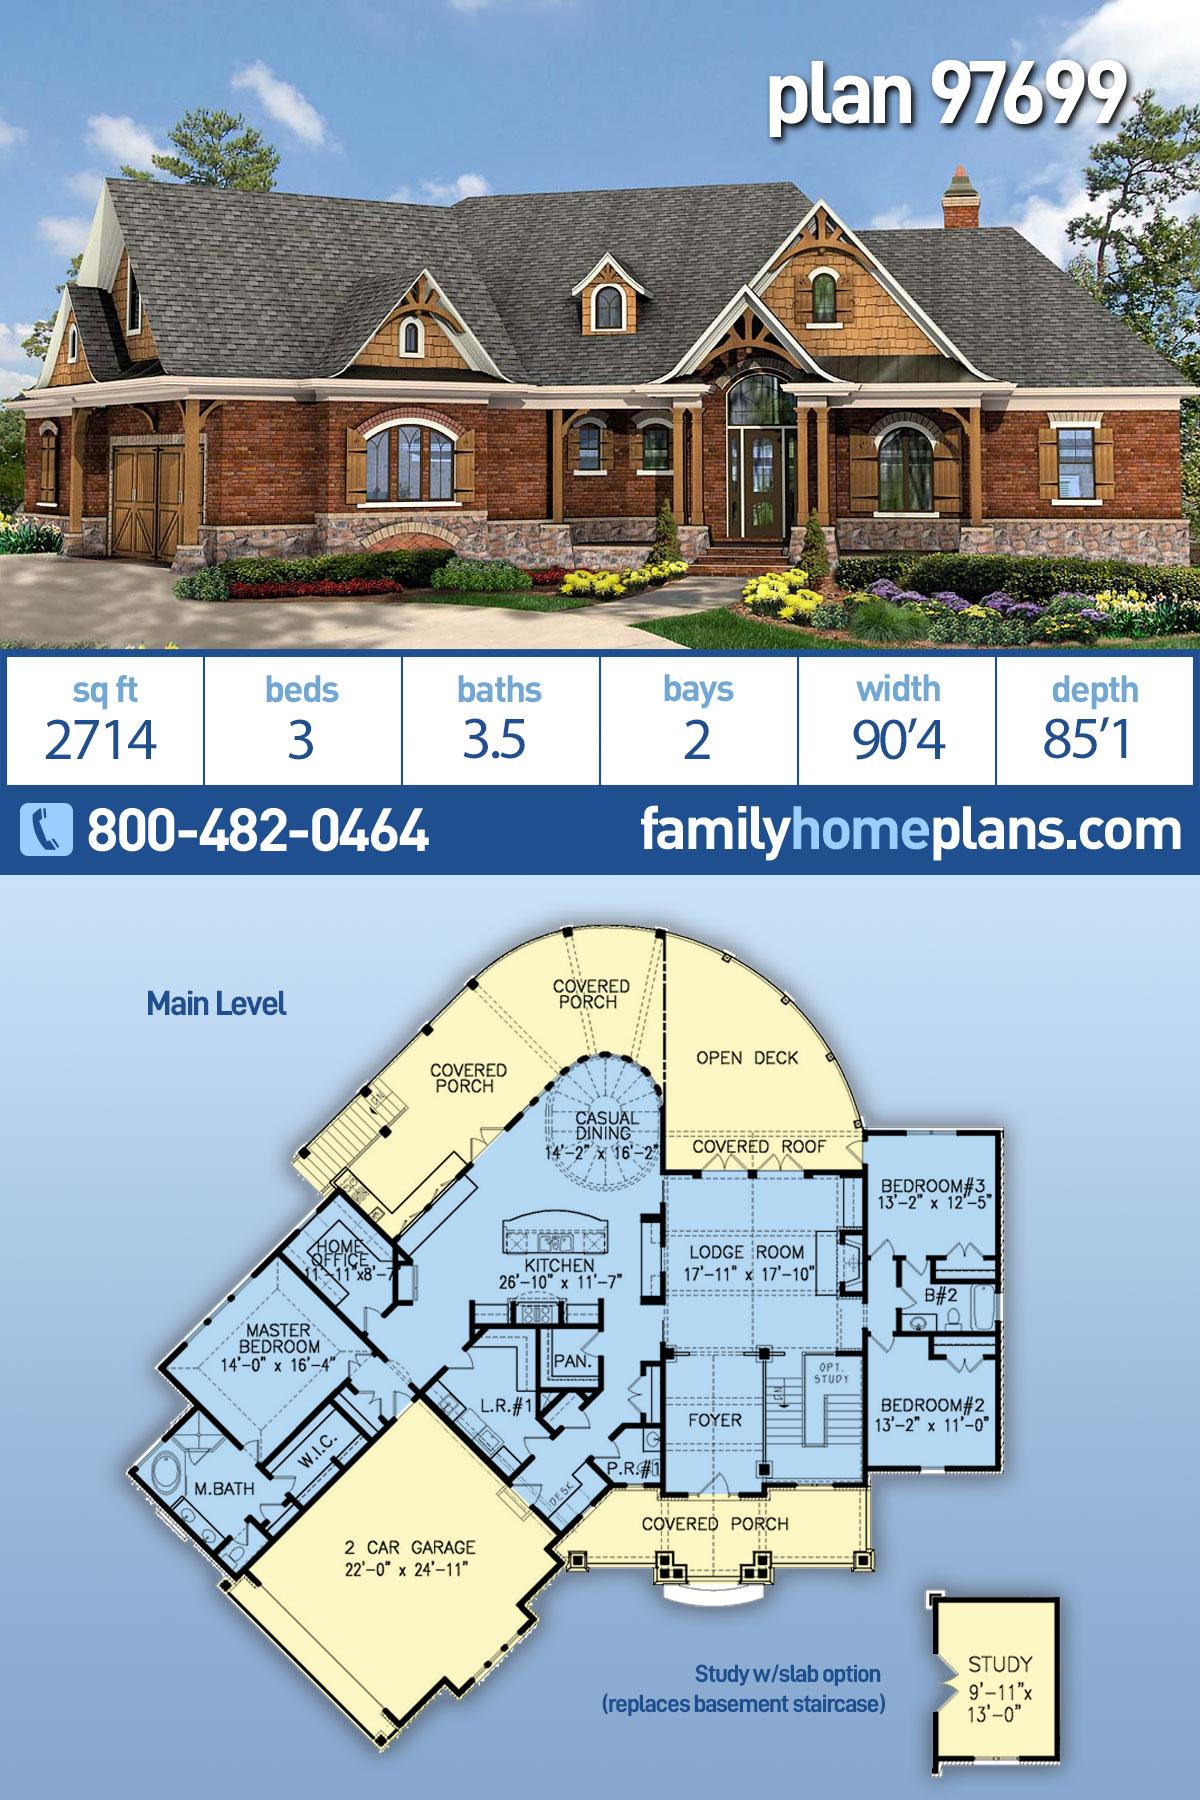 Craftsman, Ranch House Plan 97699 with 3 Beds, 4 Baths, 2 Car Garage